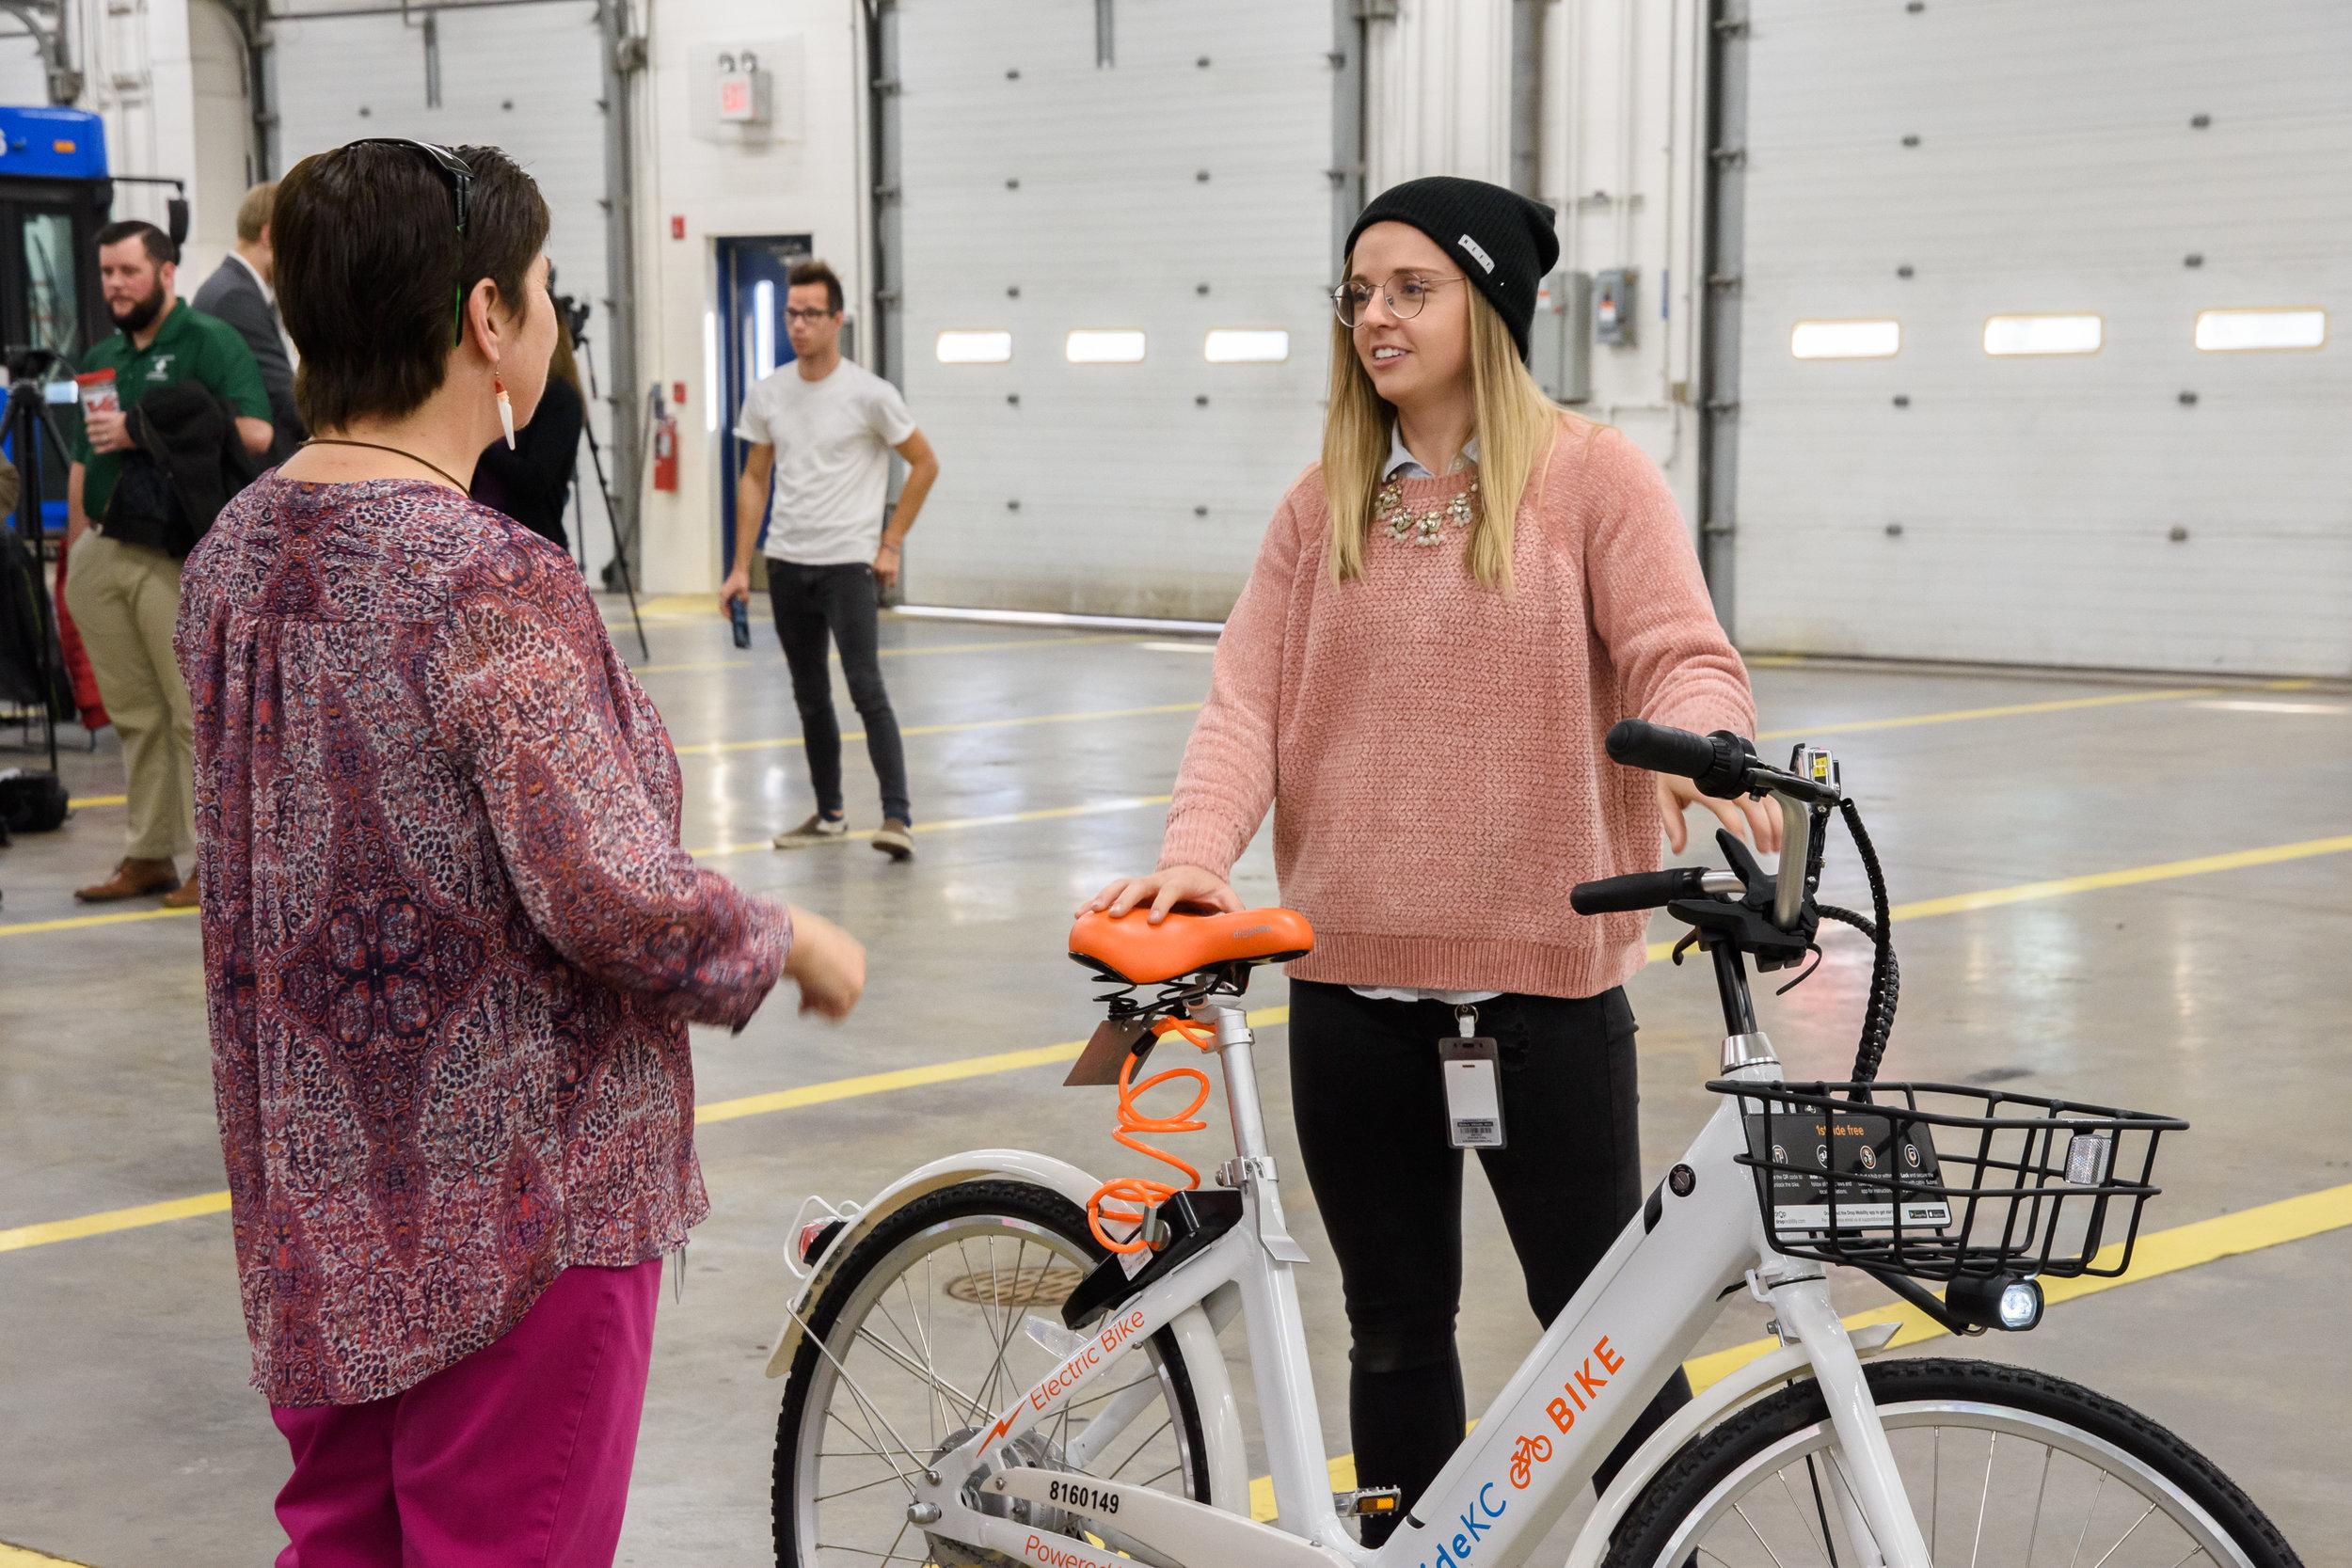 ridekc-bike-launch-event_45438338854_o.jpg